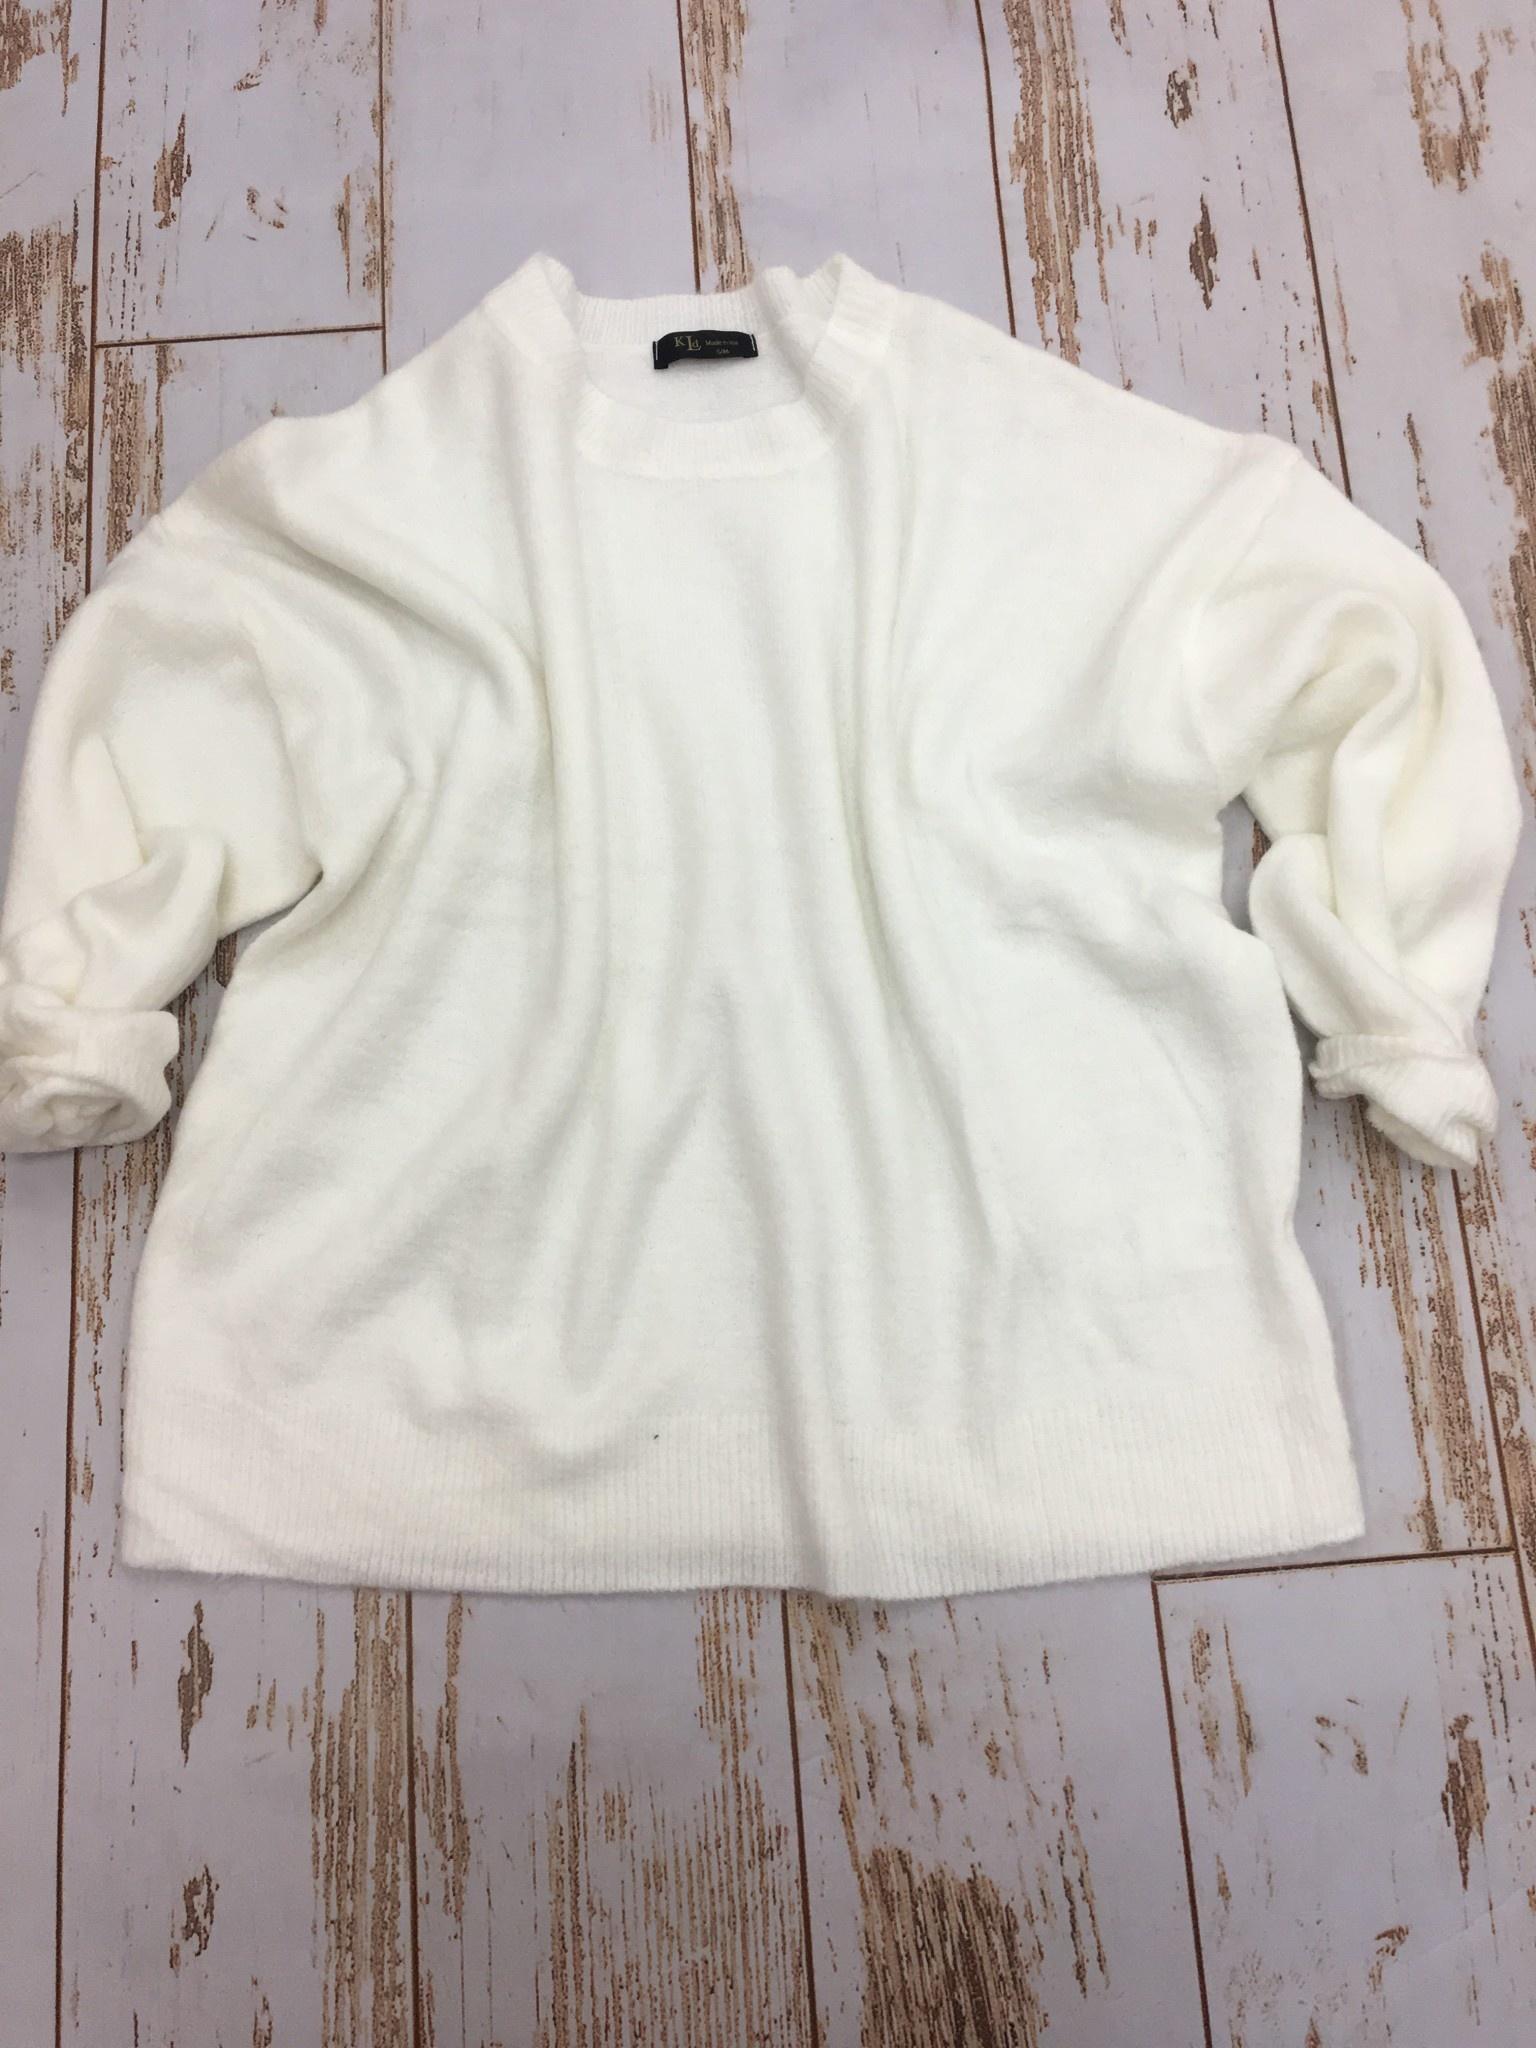 KLD Ivory Puff Sleeve Sweater